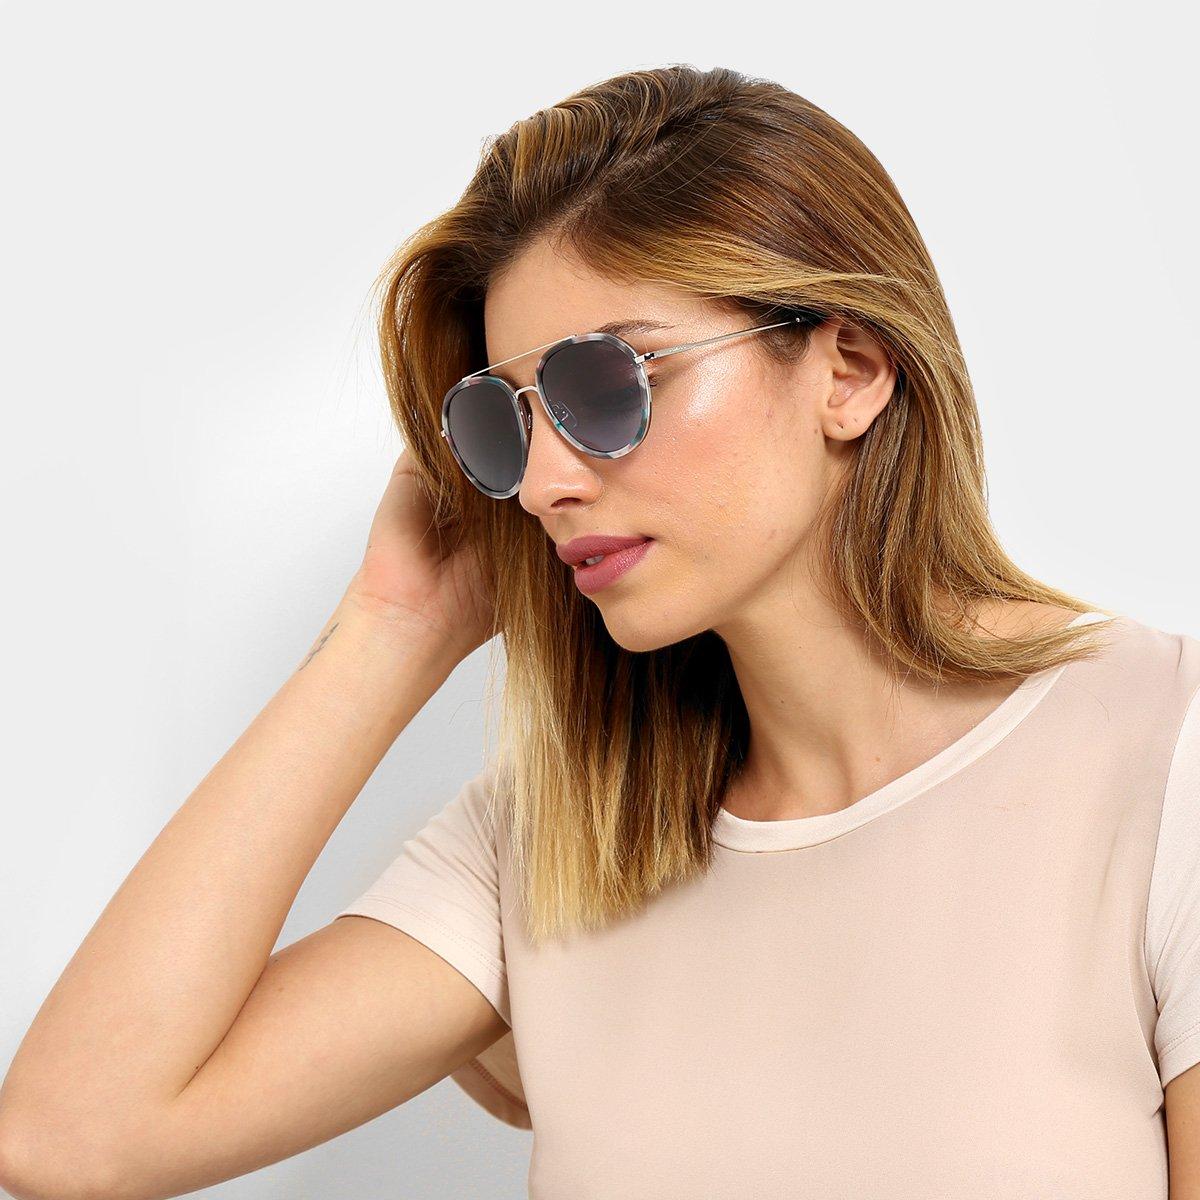 7cc03dbbf7a72 Óculos de Sol Colcci Demi Azul Feminino - Compre Agora   Netshoes